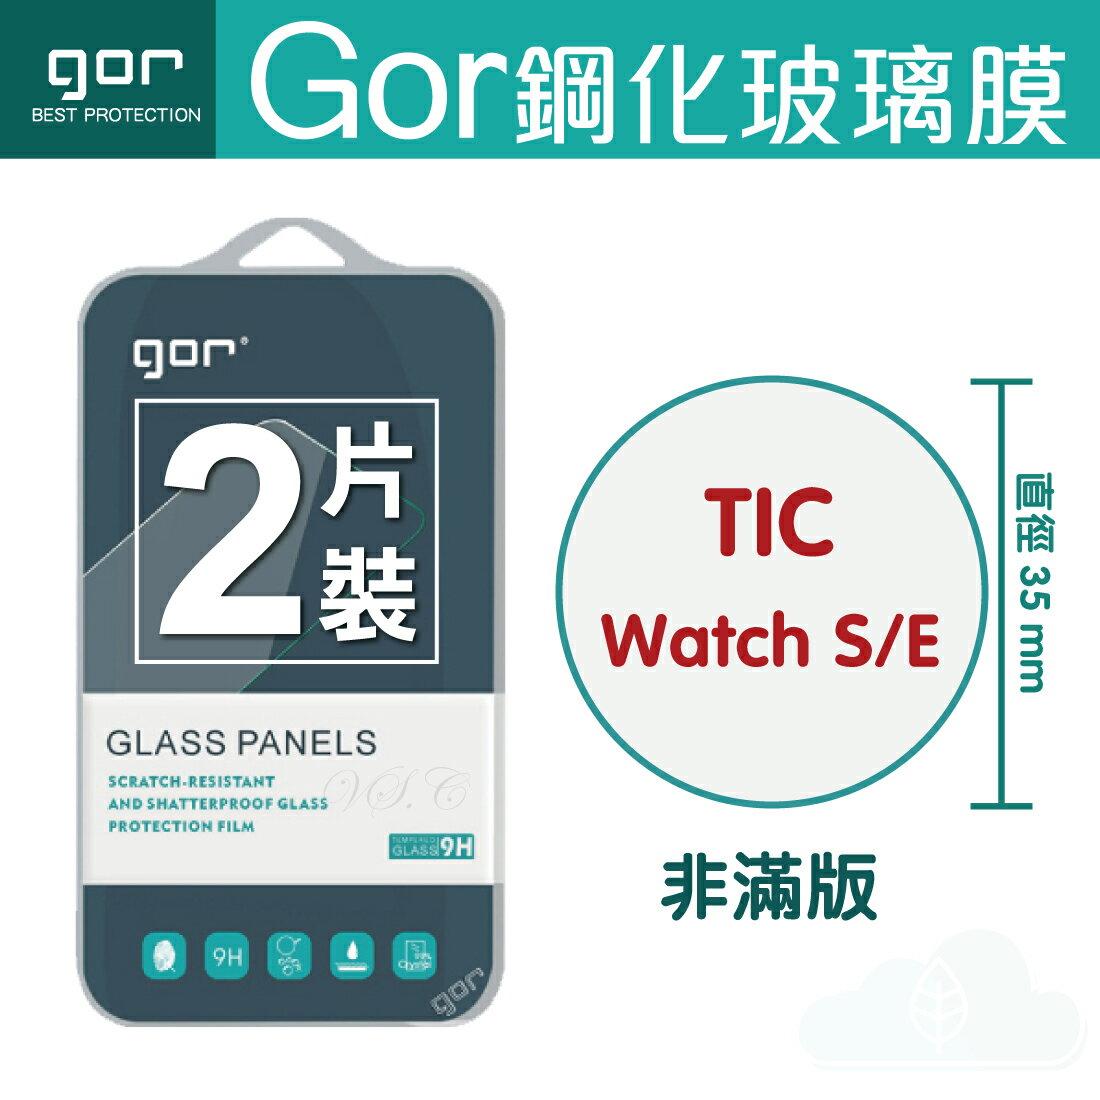 【TIC】GOR 9H TIC watch S/E Android Wear 智慧 手錶 穿戴裝置 鋼化 玻璃 保護貼 全透明非滿版 兩片裝【全館滿299免運費】